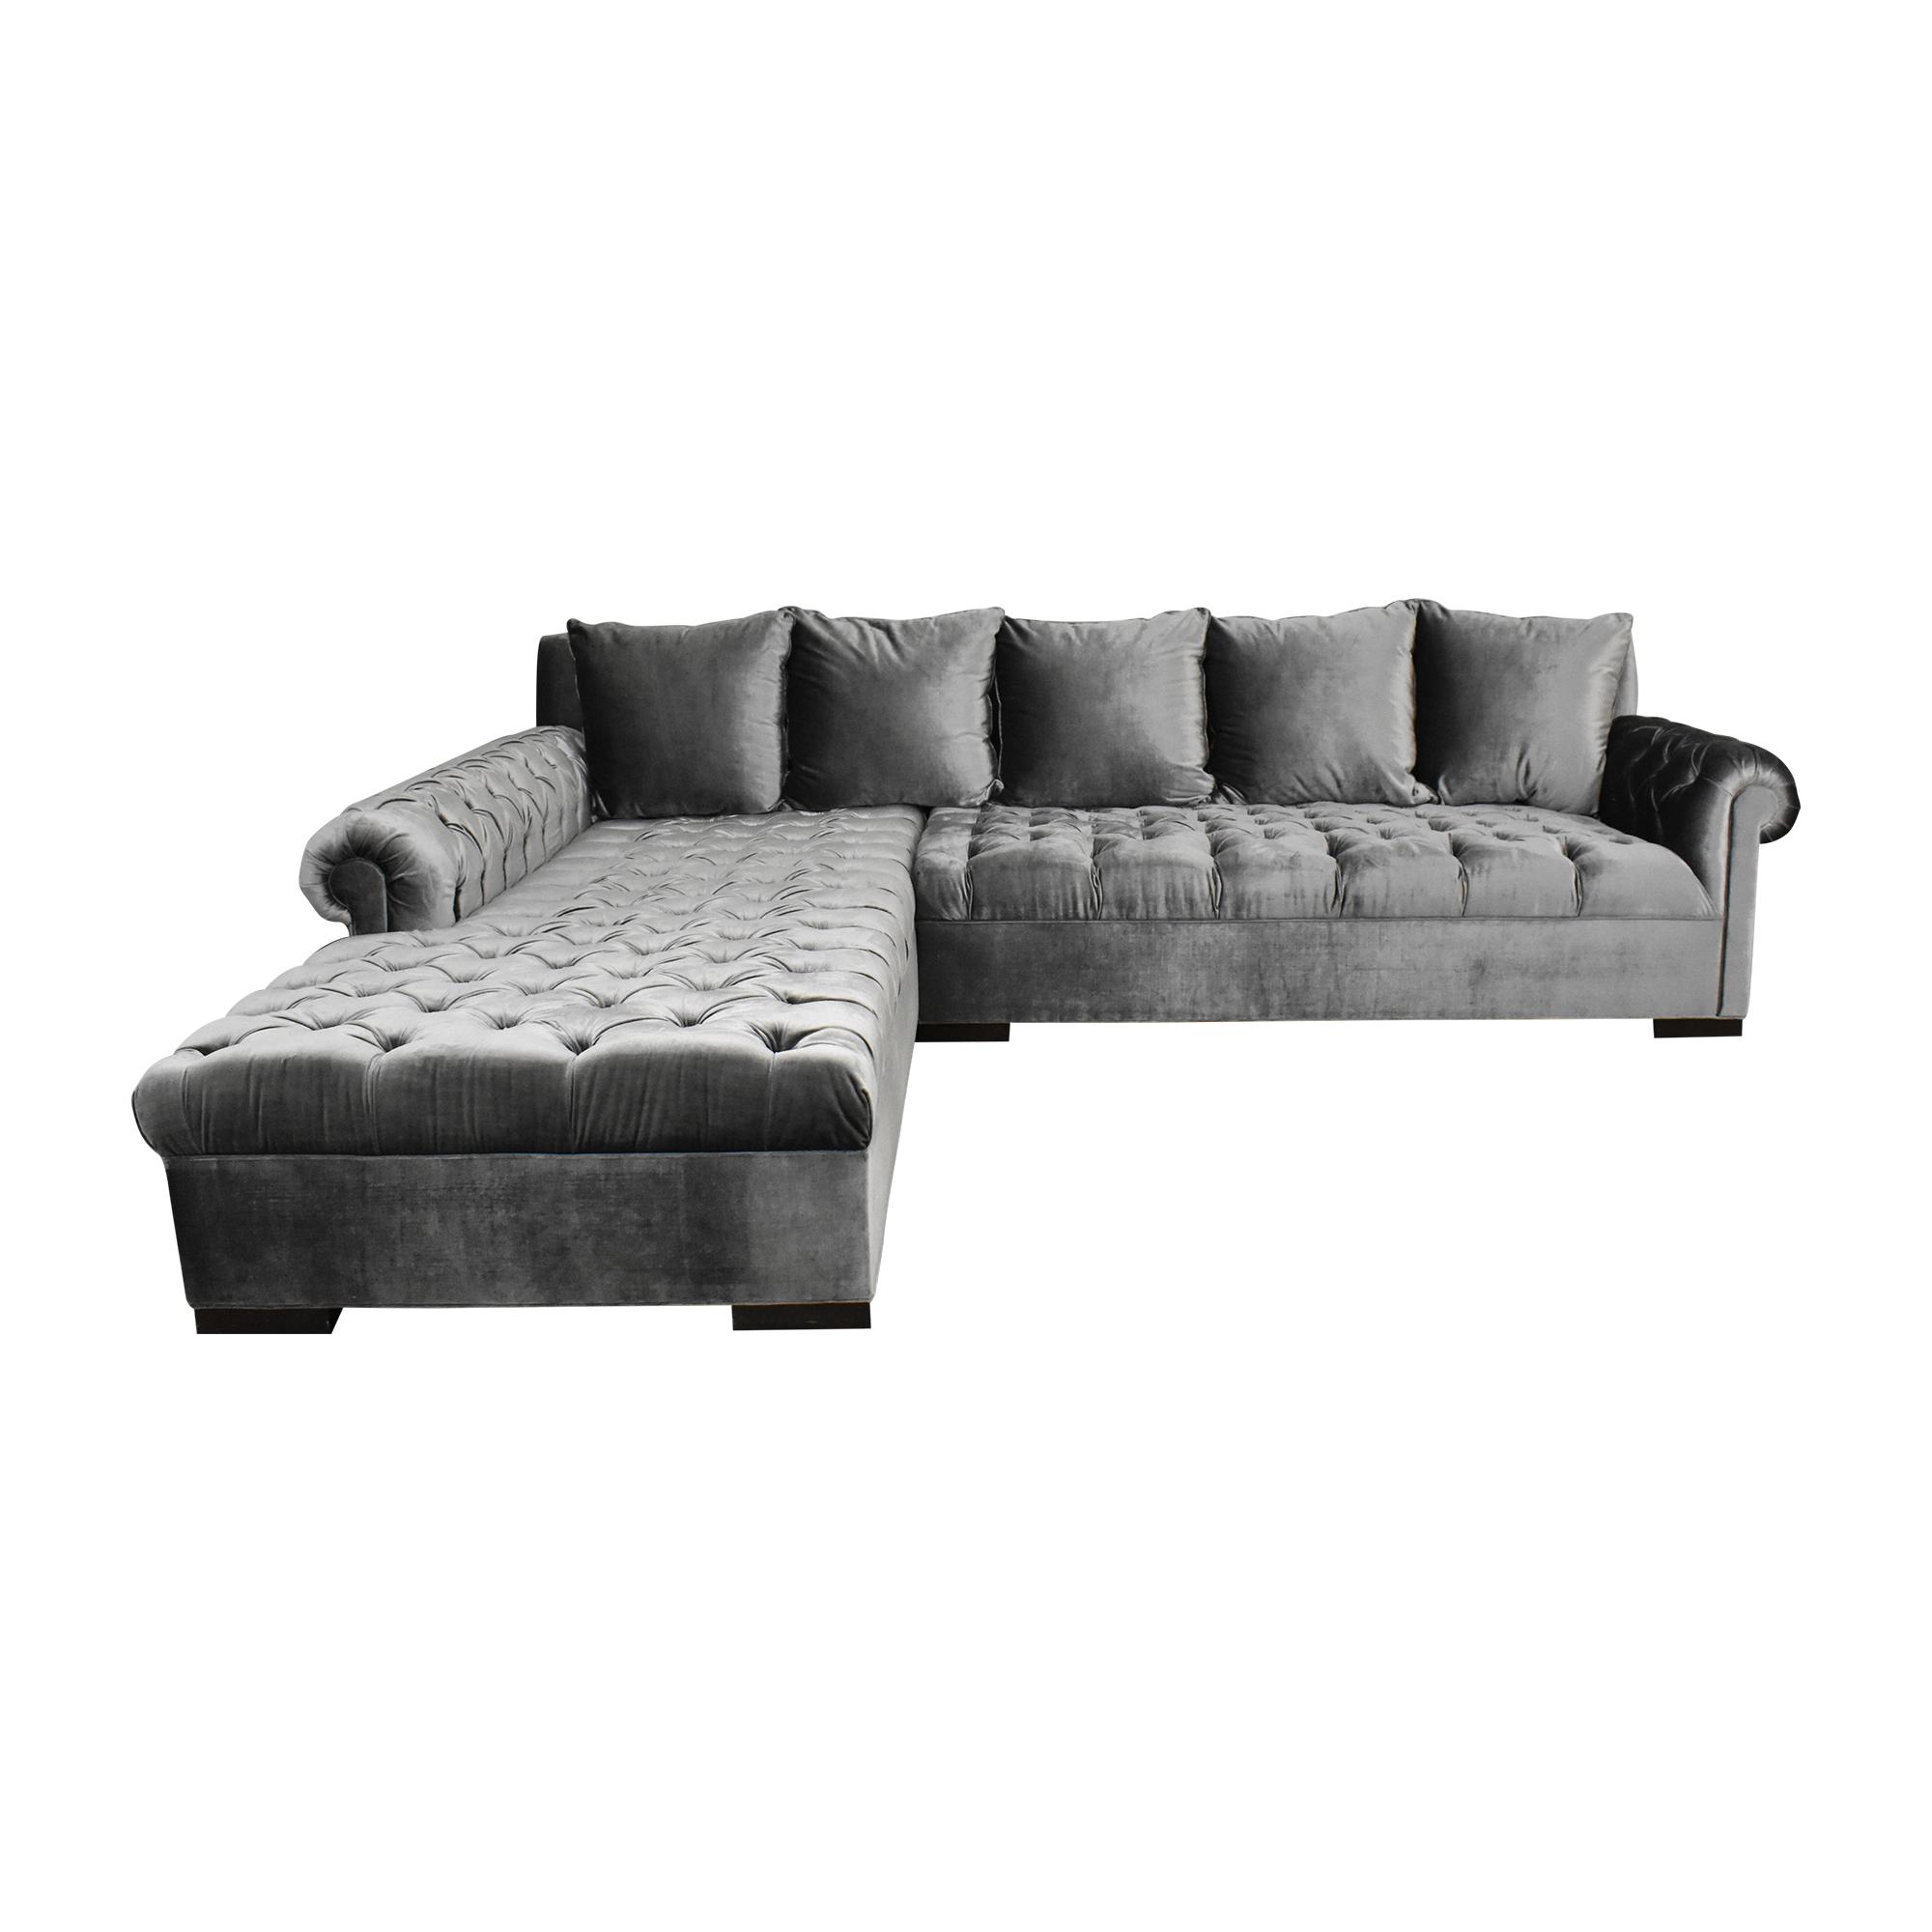 Haute House Haute House Smith Sectional Sofa with Ottoman nyc